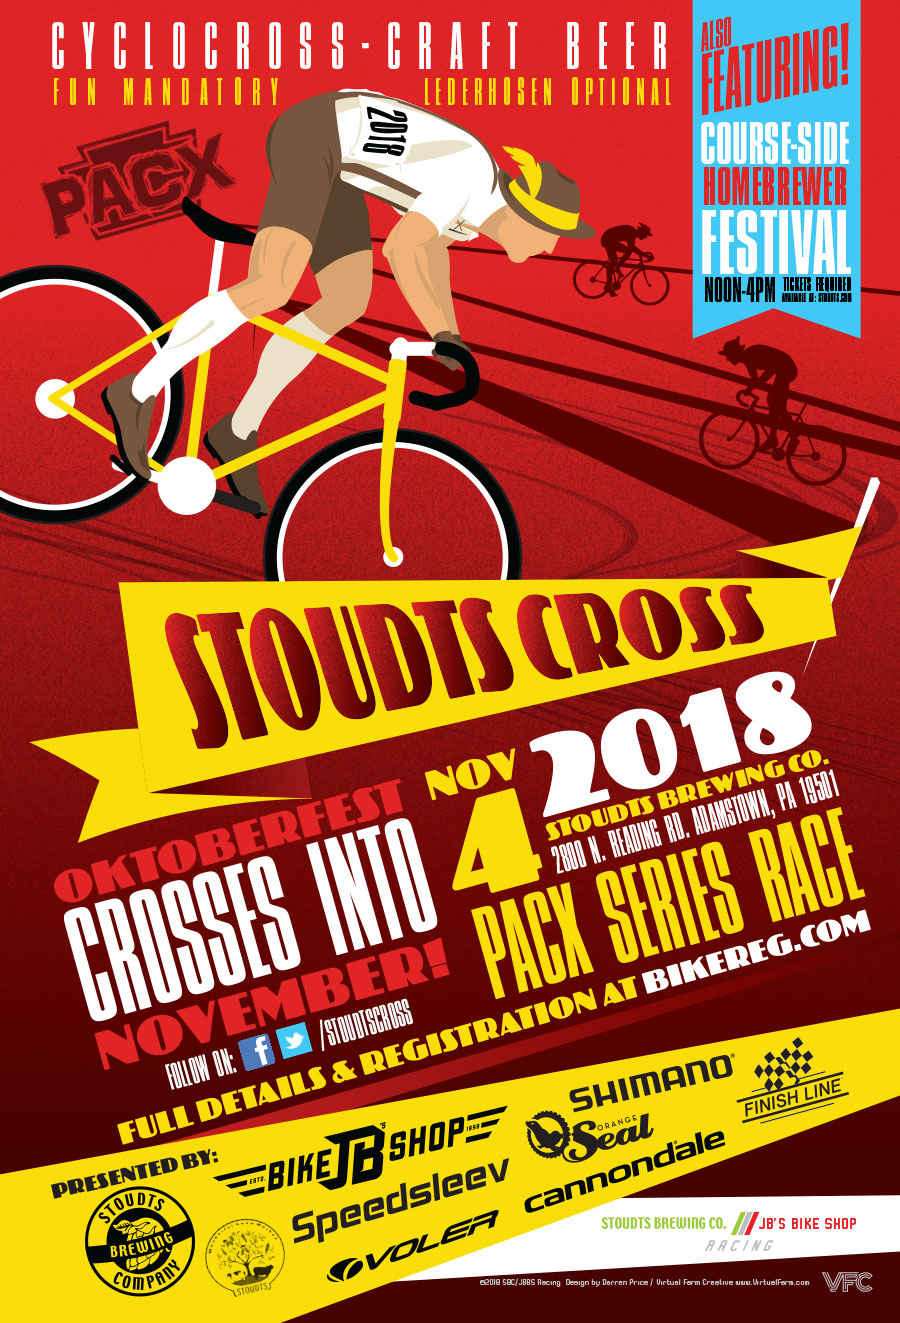 Stoudts Cross Cyclocross Race, Pennsylvania